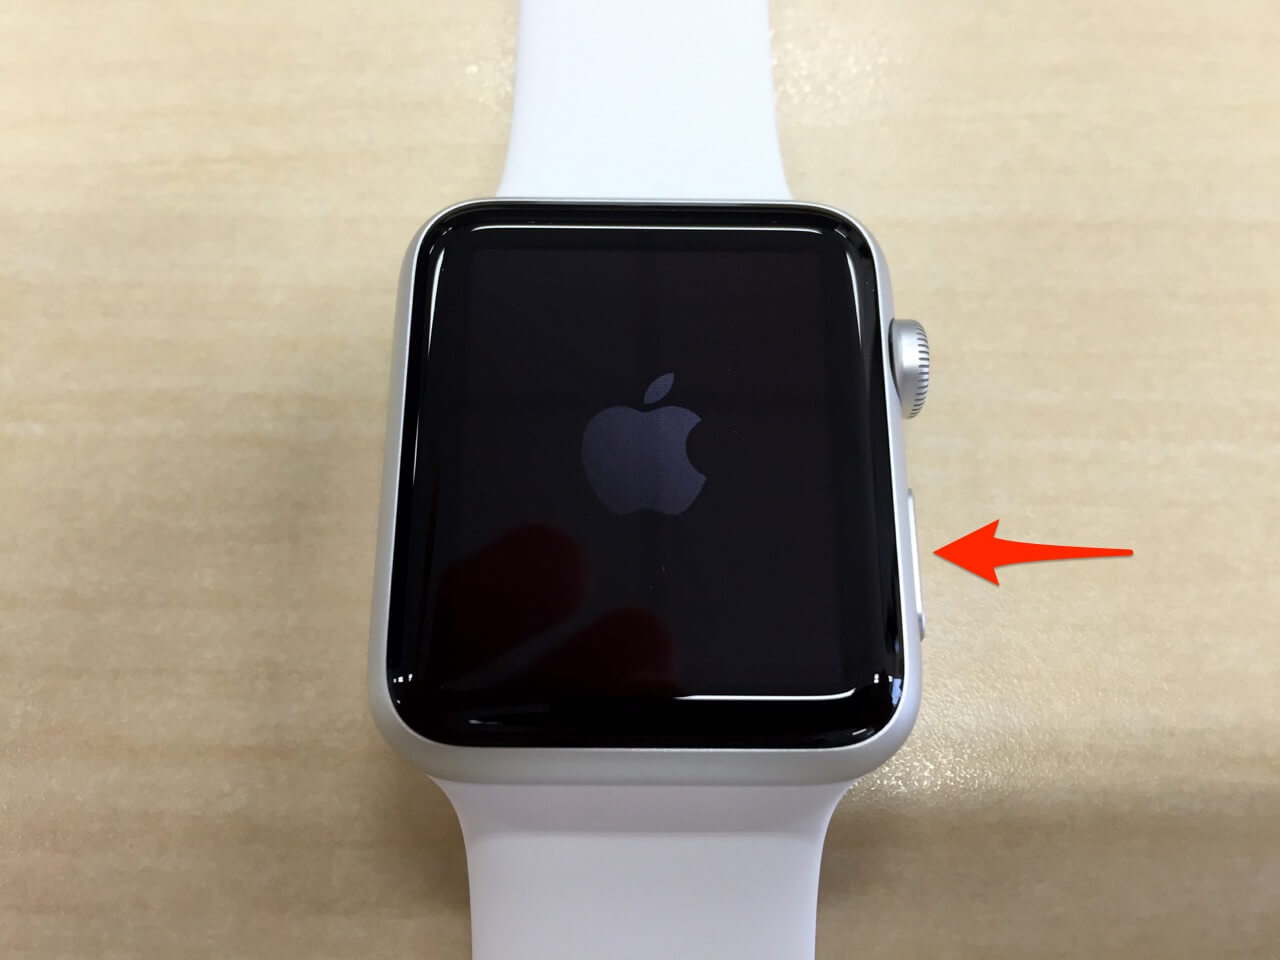 Apple Watchの電源をオンにする